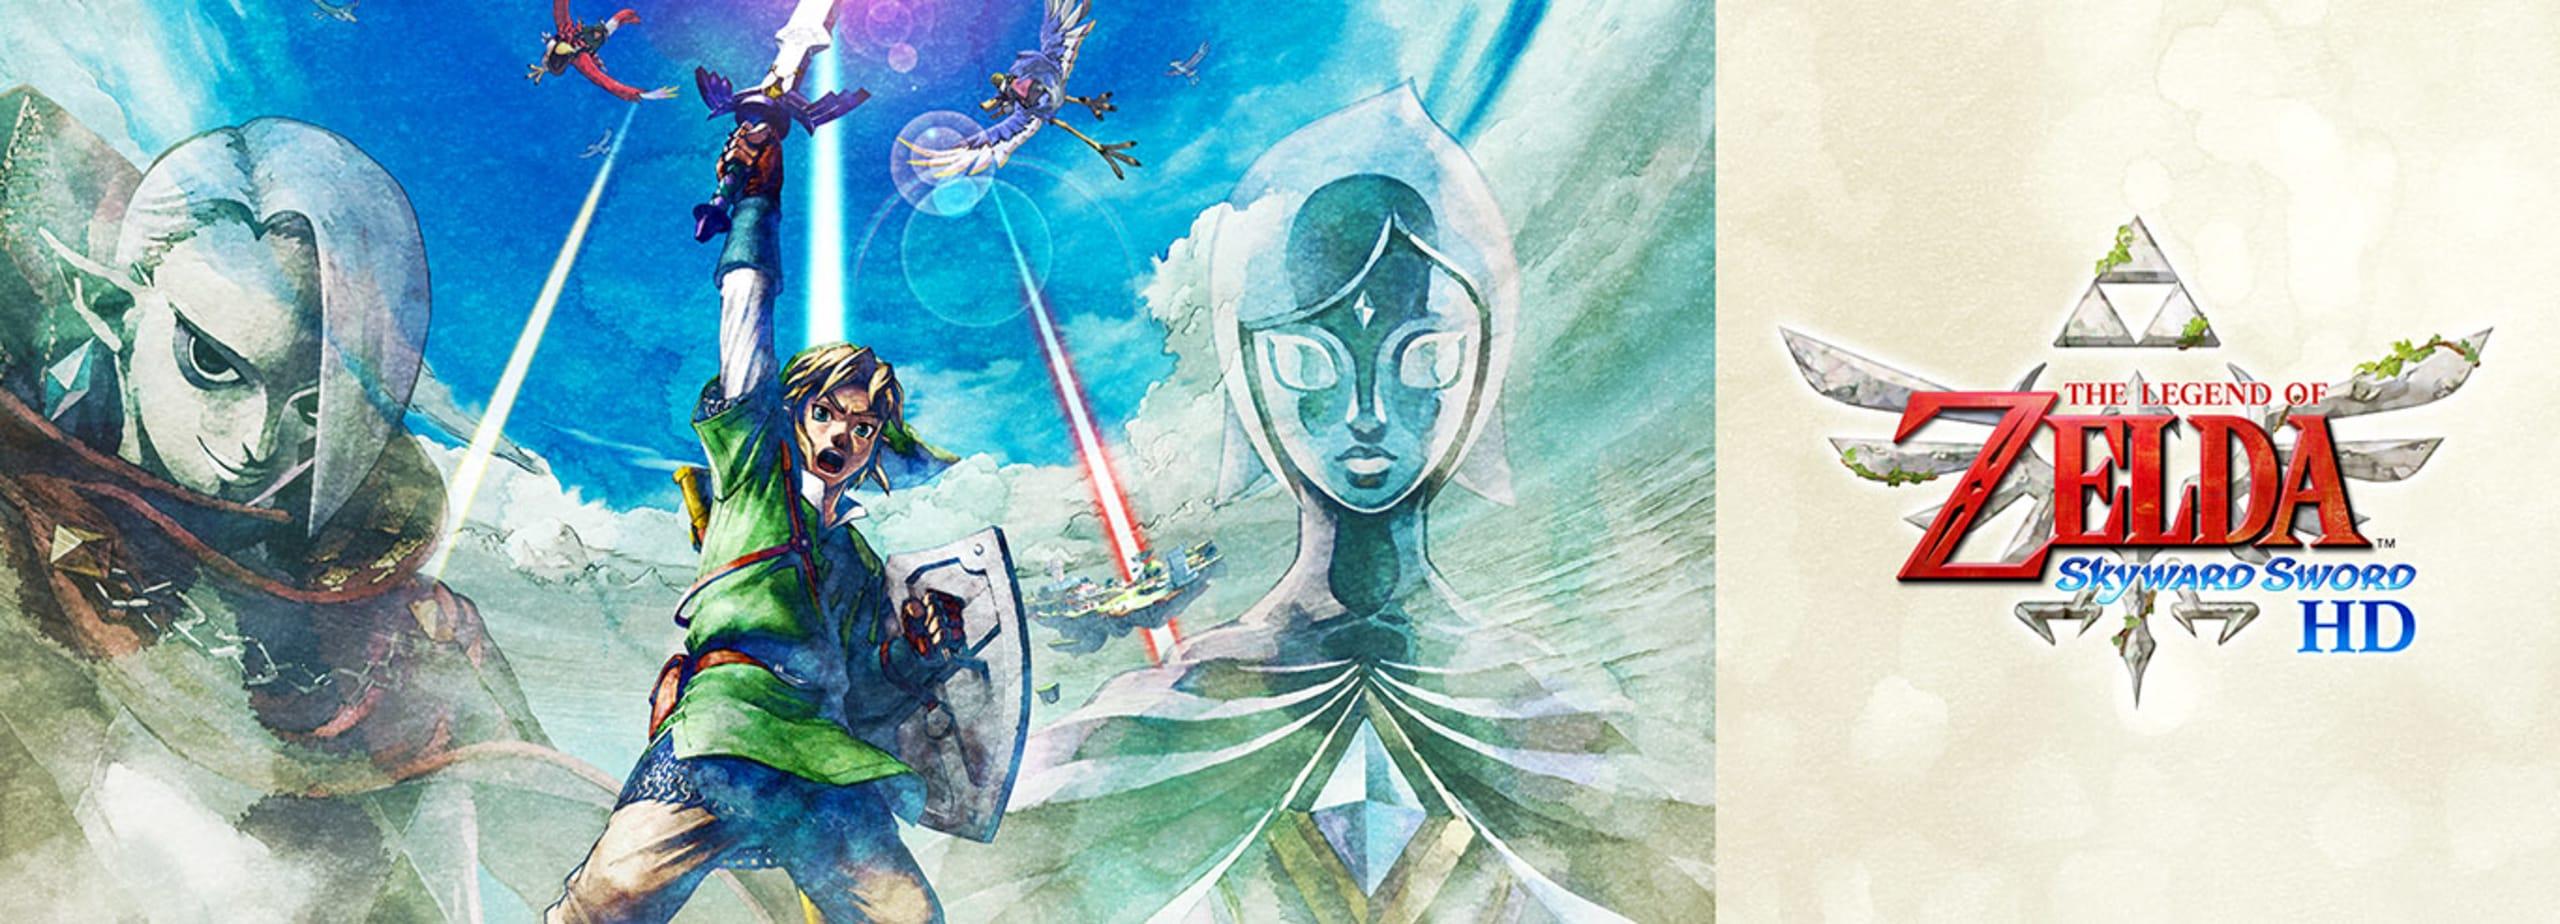 The Legend of Zelda: Skyward Sword HD - Ya disponible